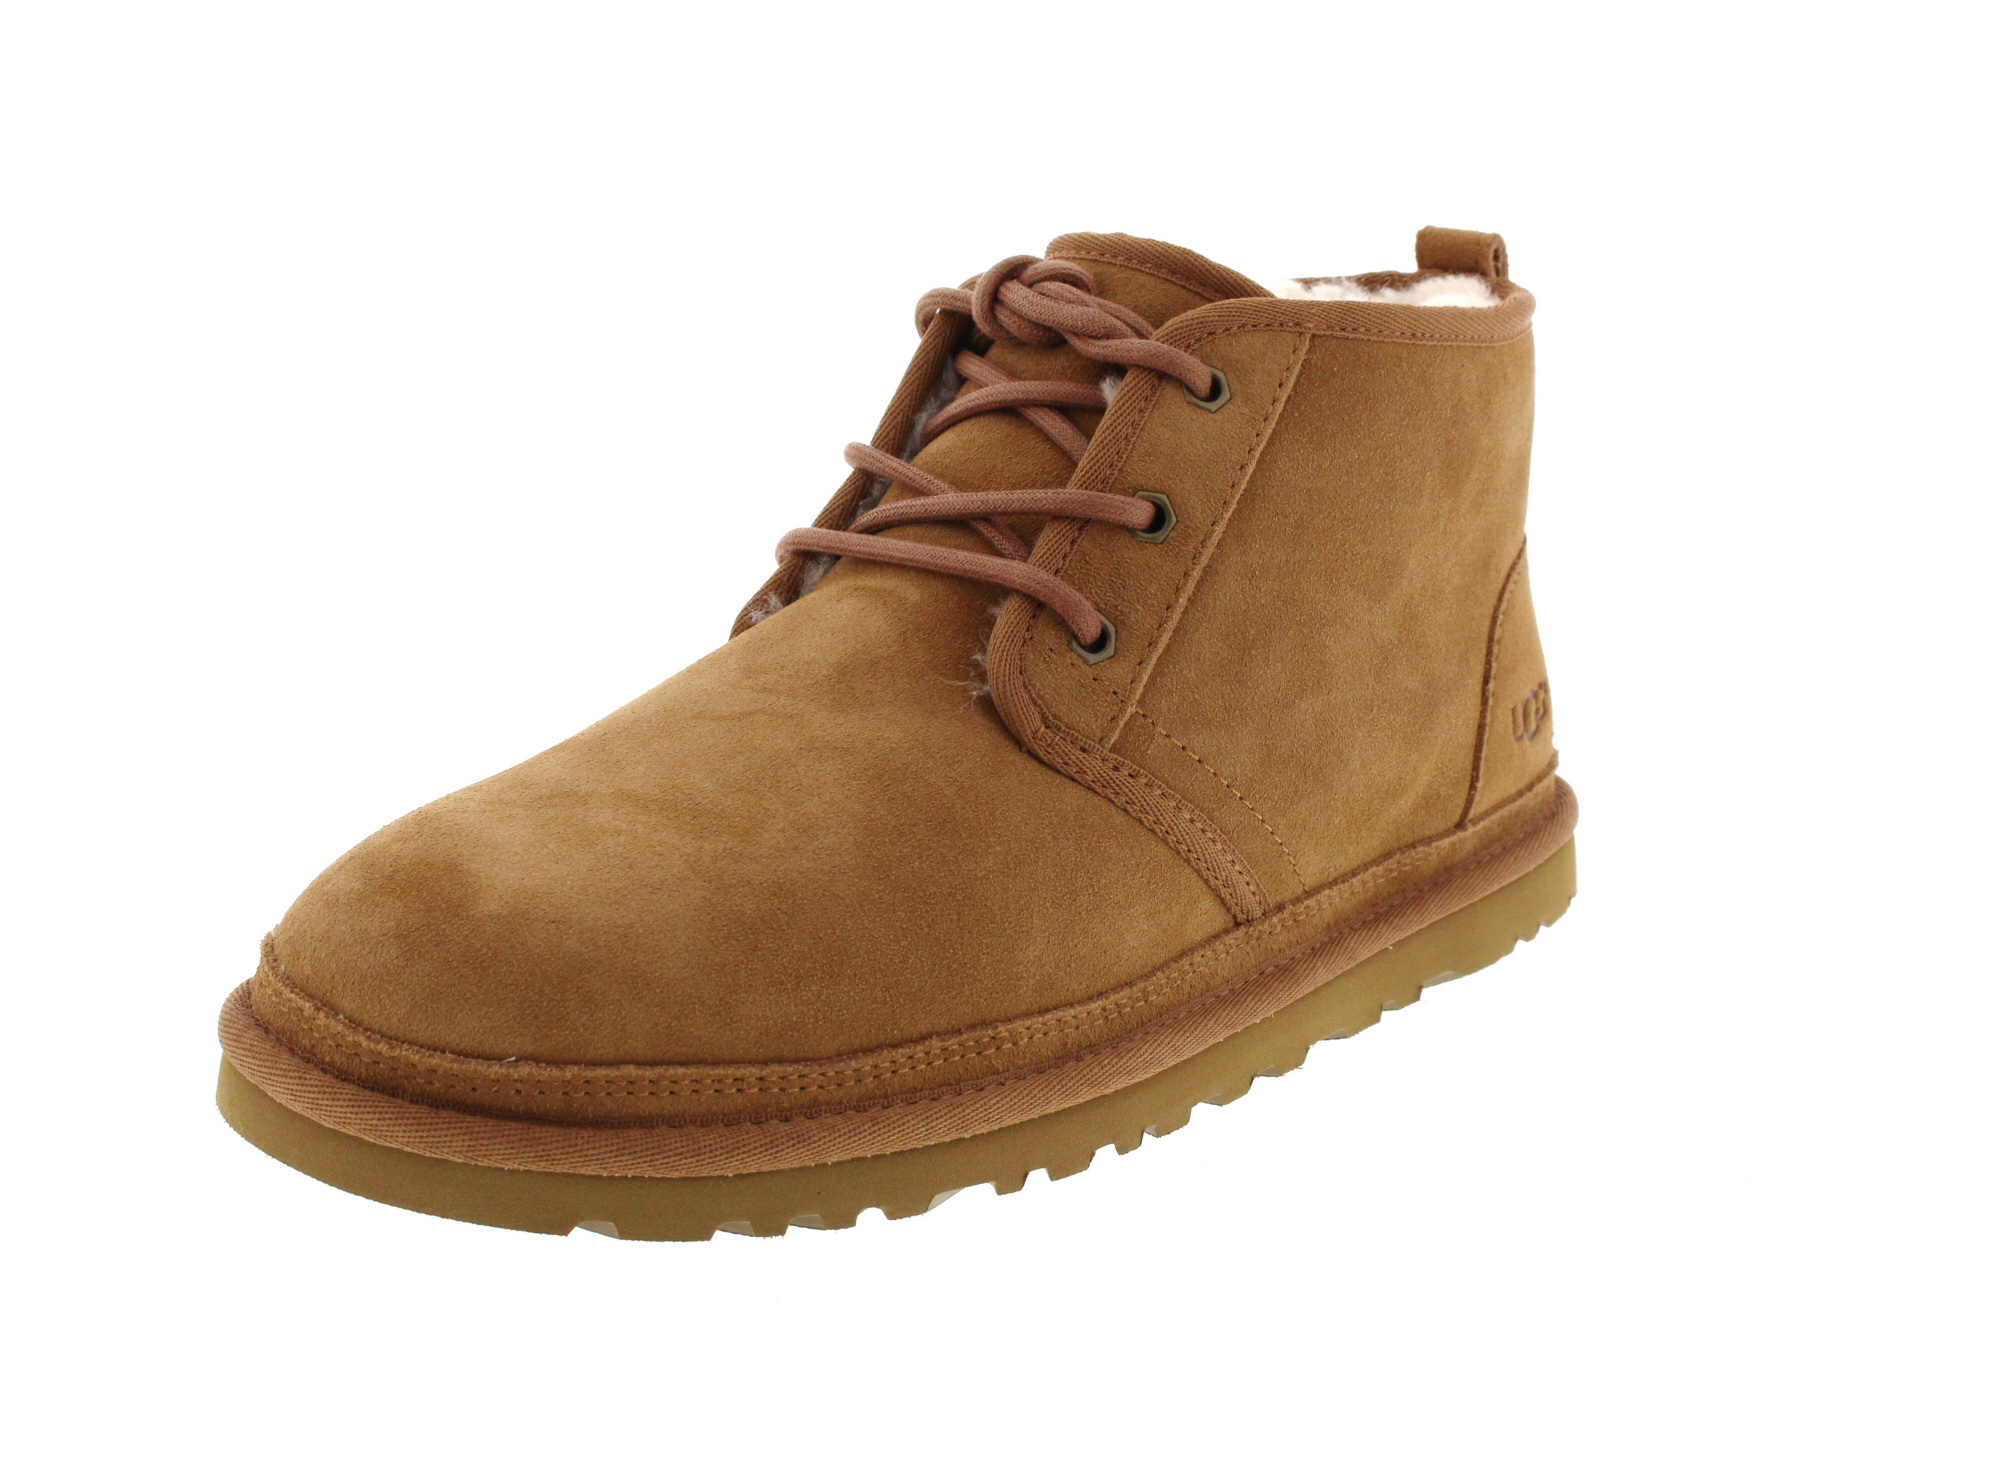 UGG Herrenschuhe - Boots NEUMEL - chestnut_0